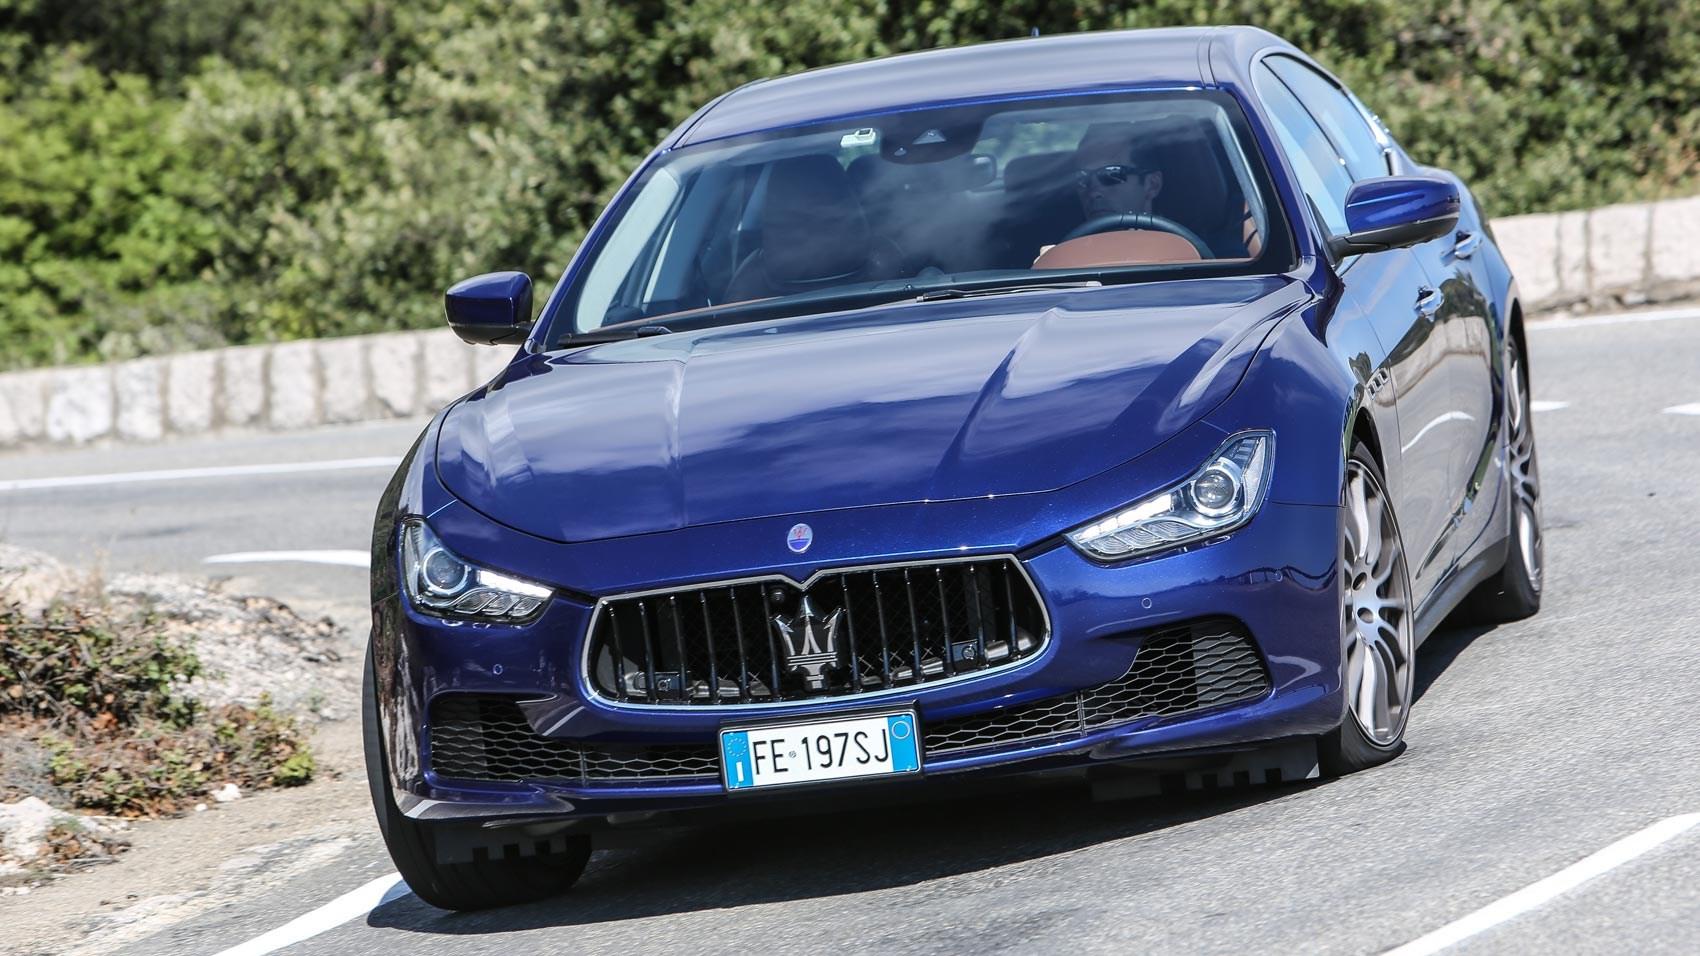 Maserati Ghibli Lease >> Maserati Ghibli Diesel (2016) review | CAR Magazine